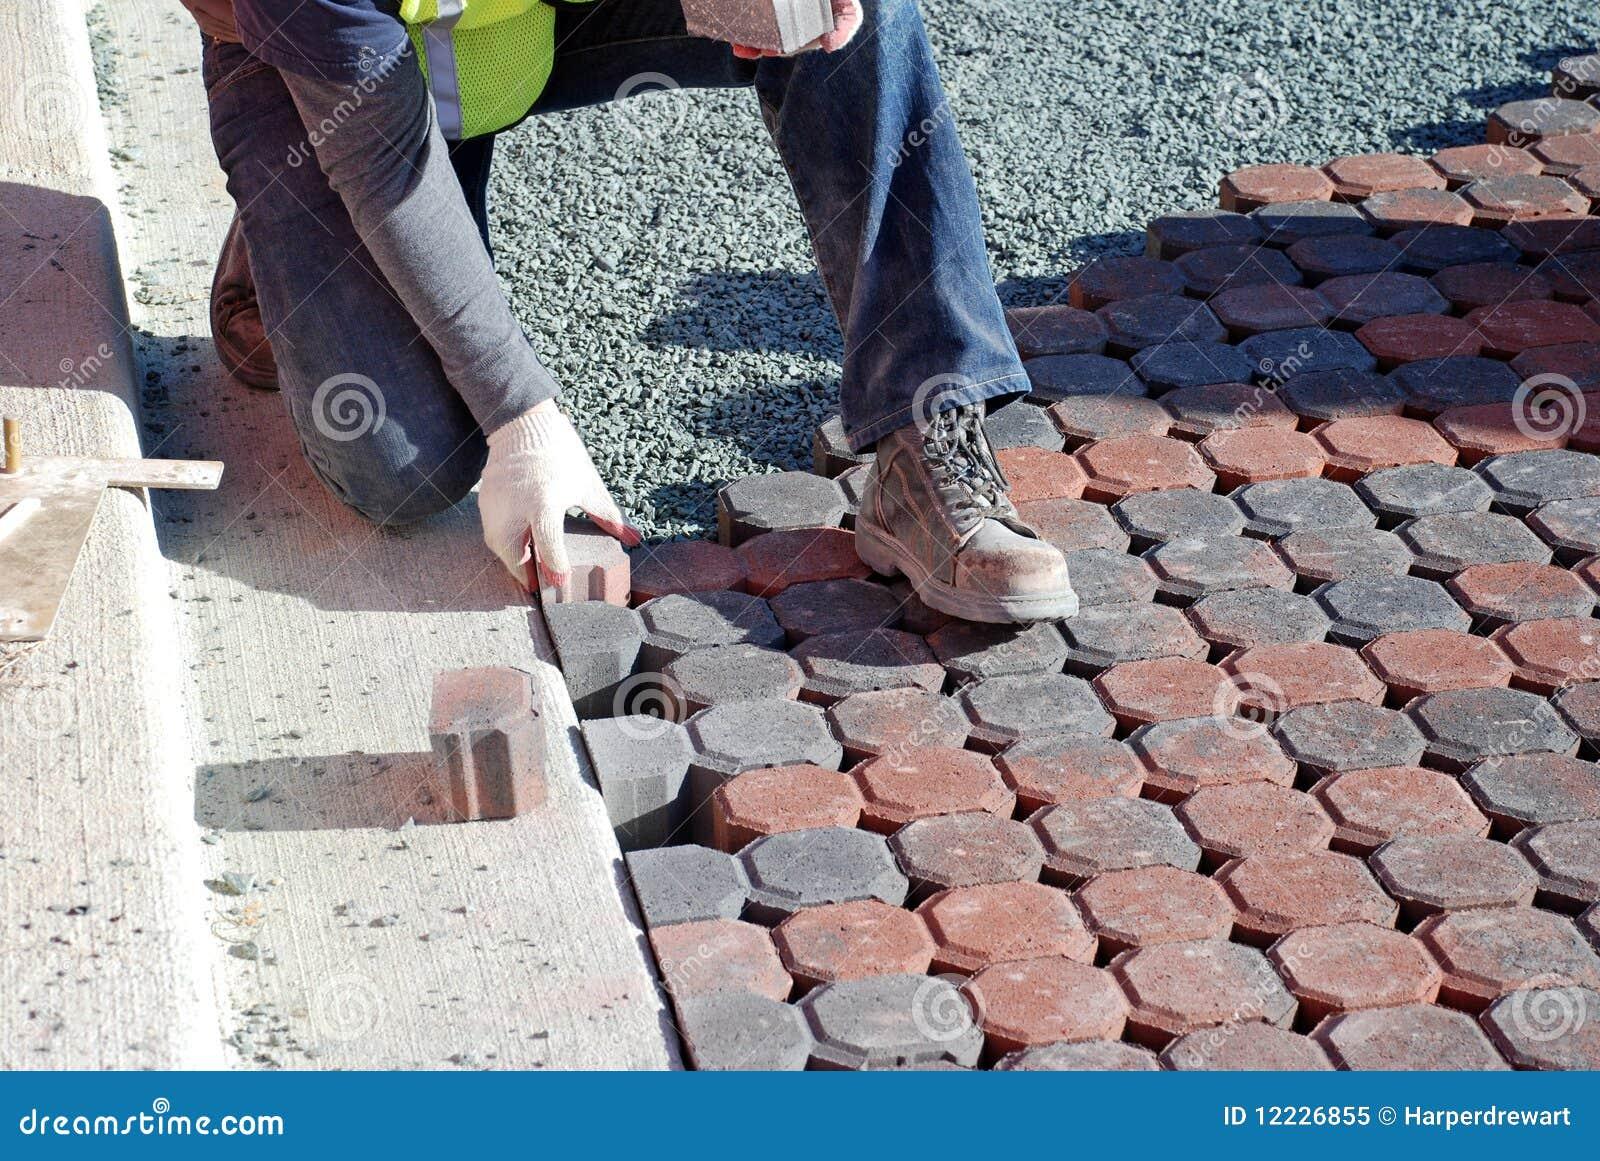 Man Placing Paving Stones Stock Image Image Of Laborer